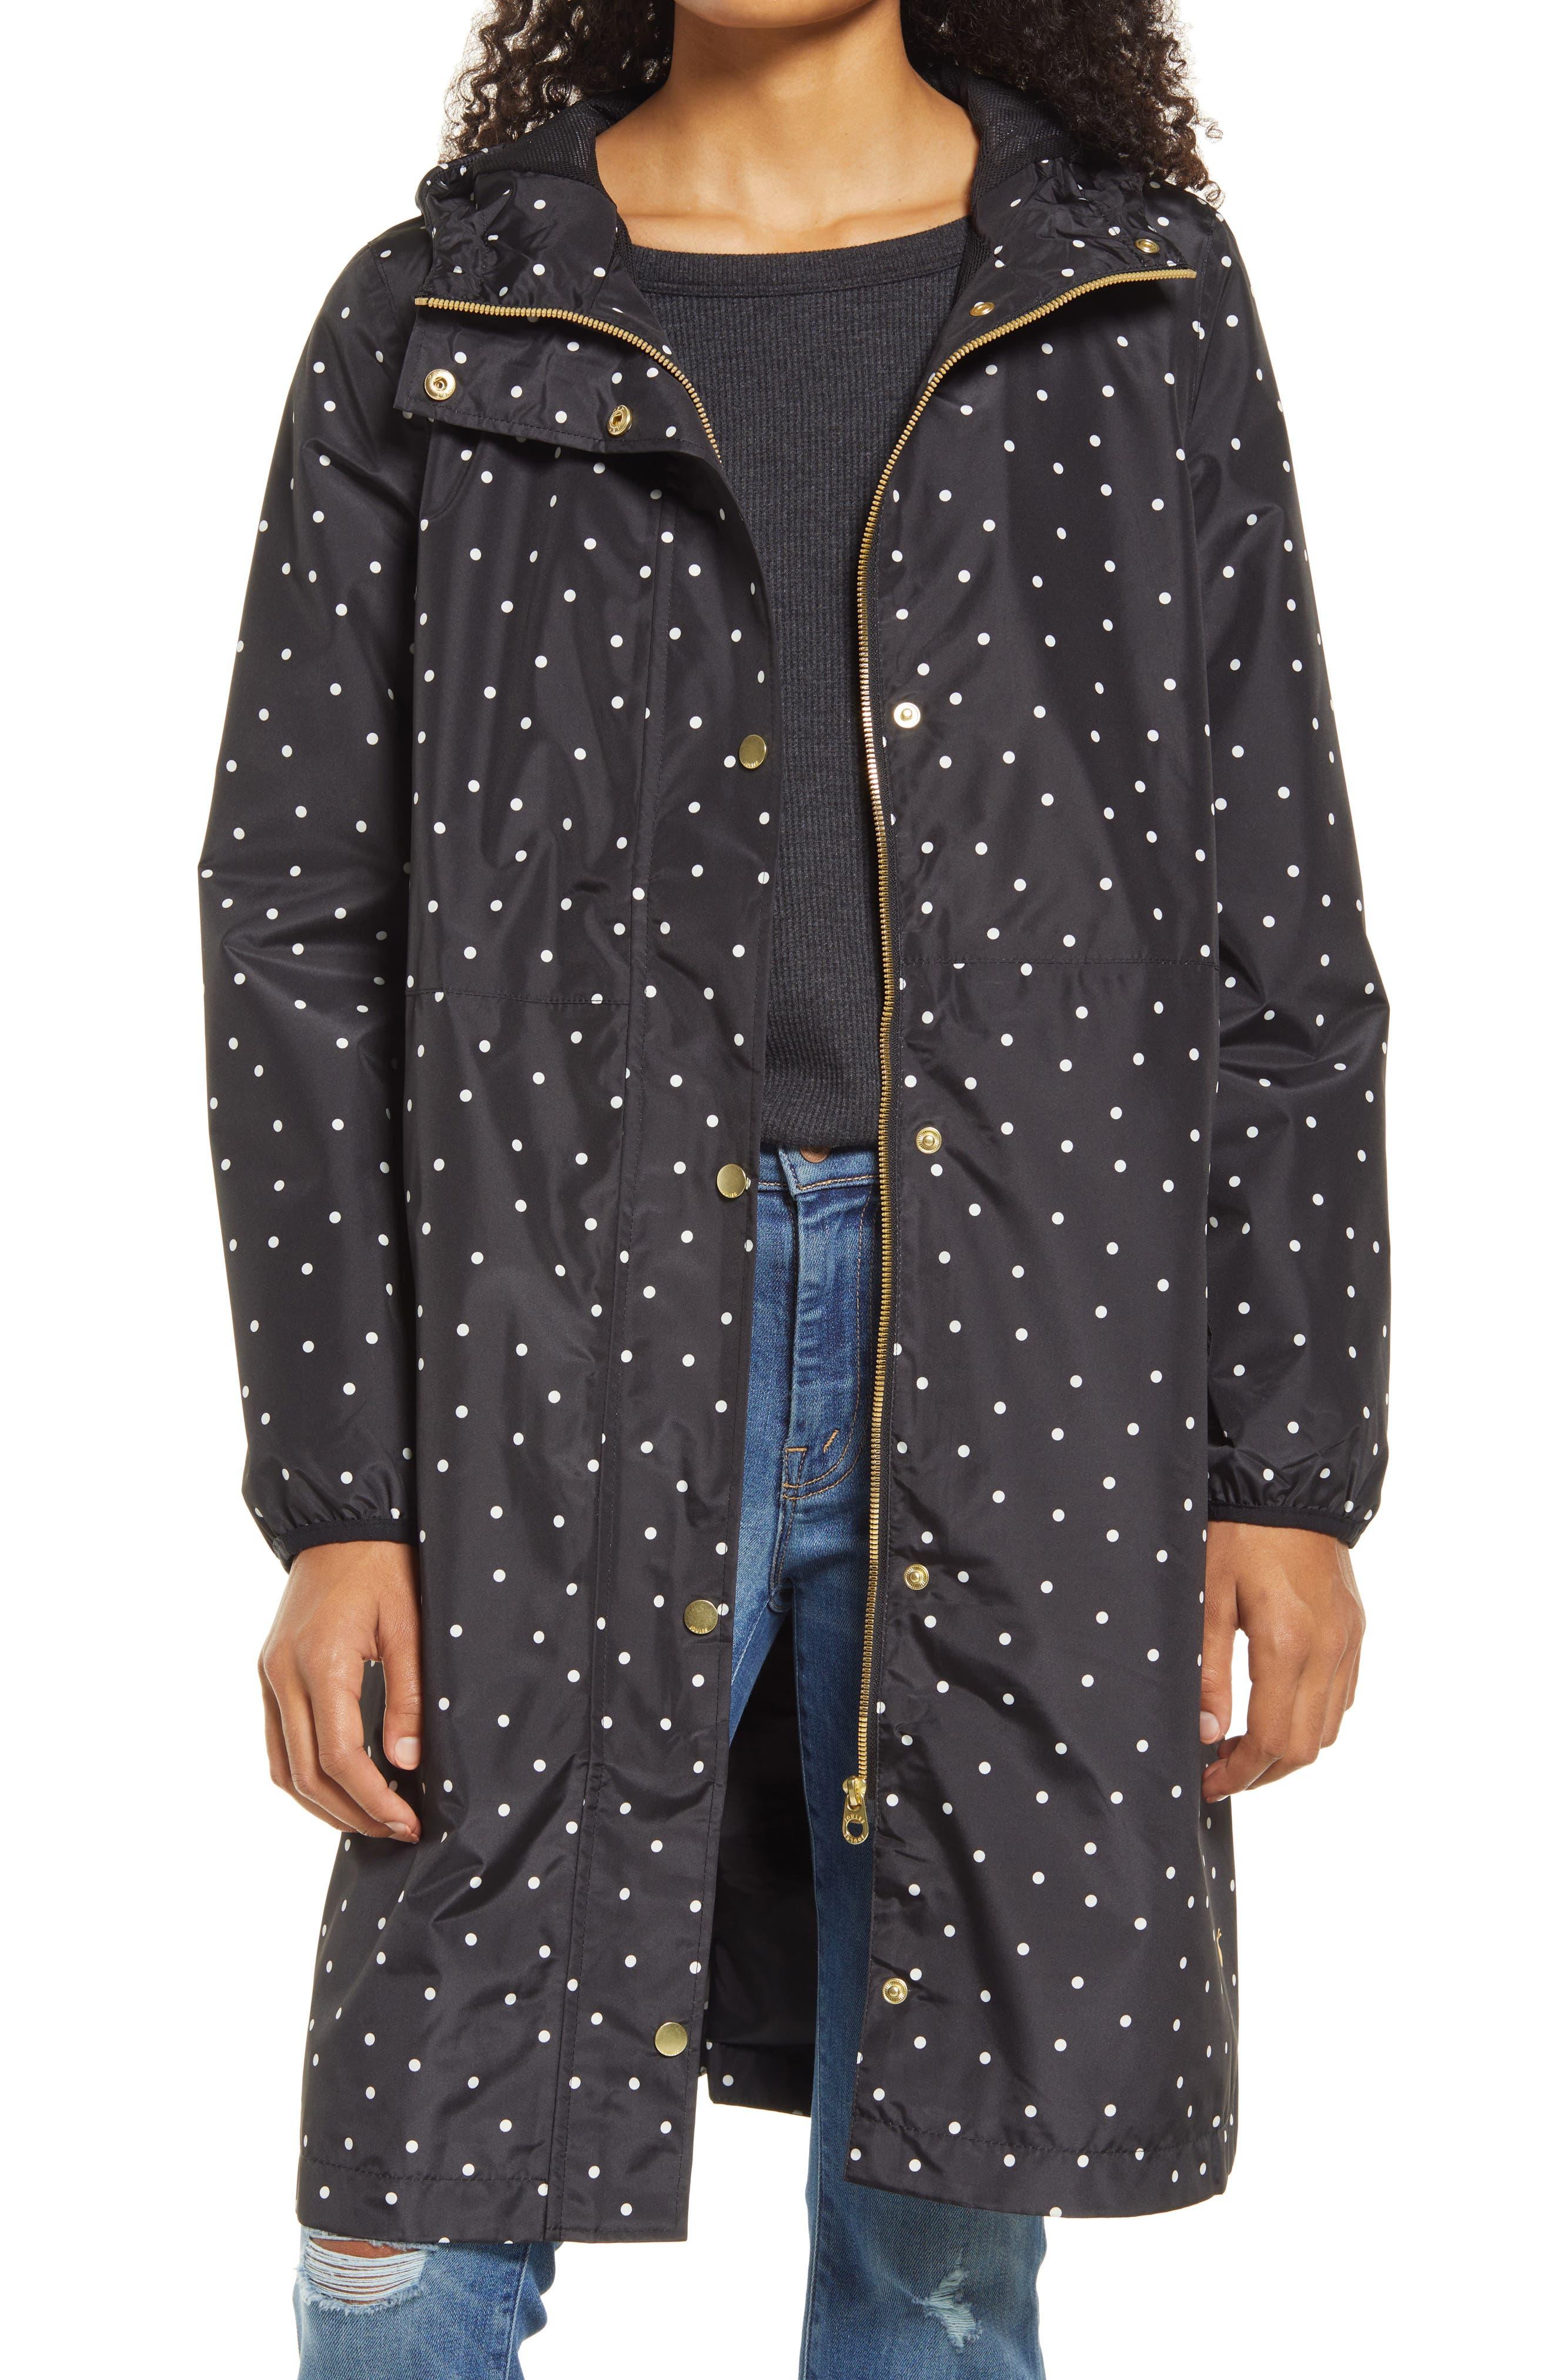 Waybridge Packable Hooded Rain Jacket